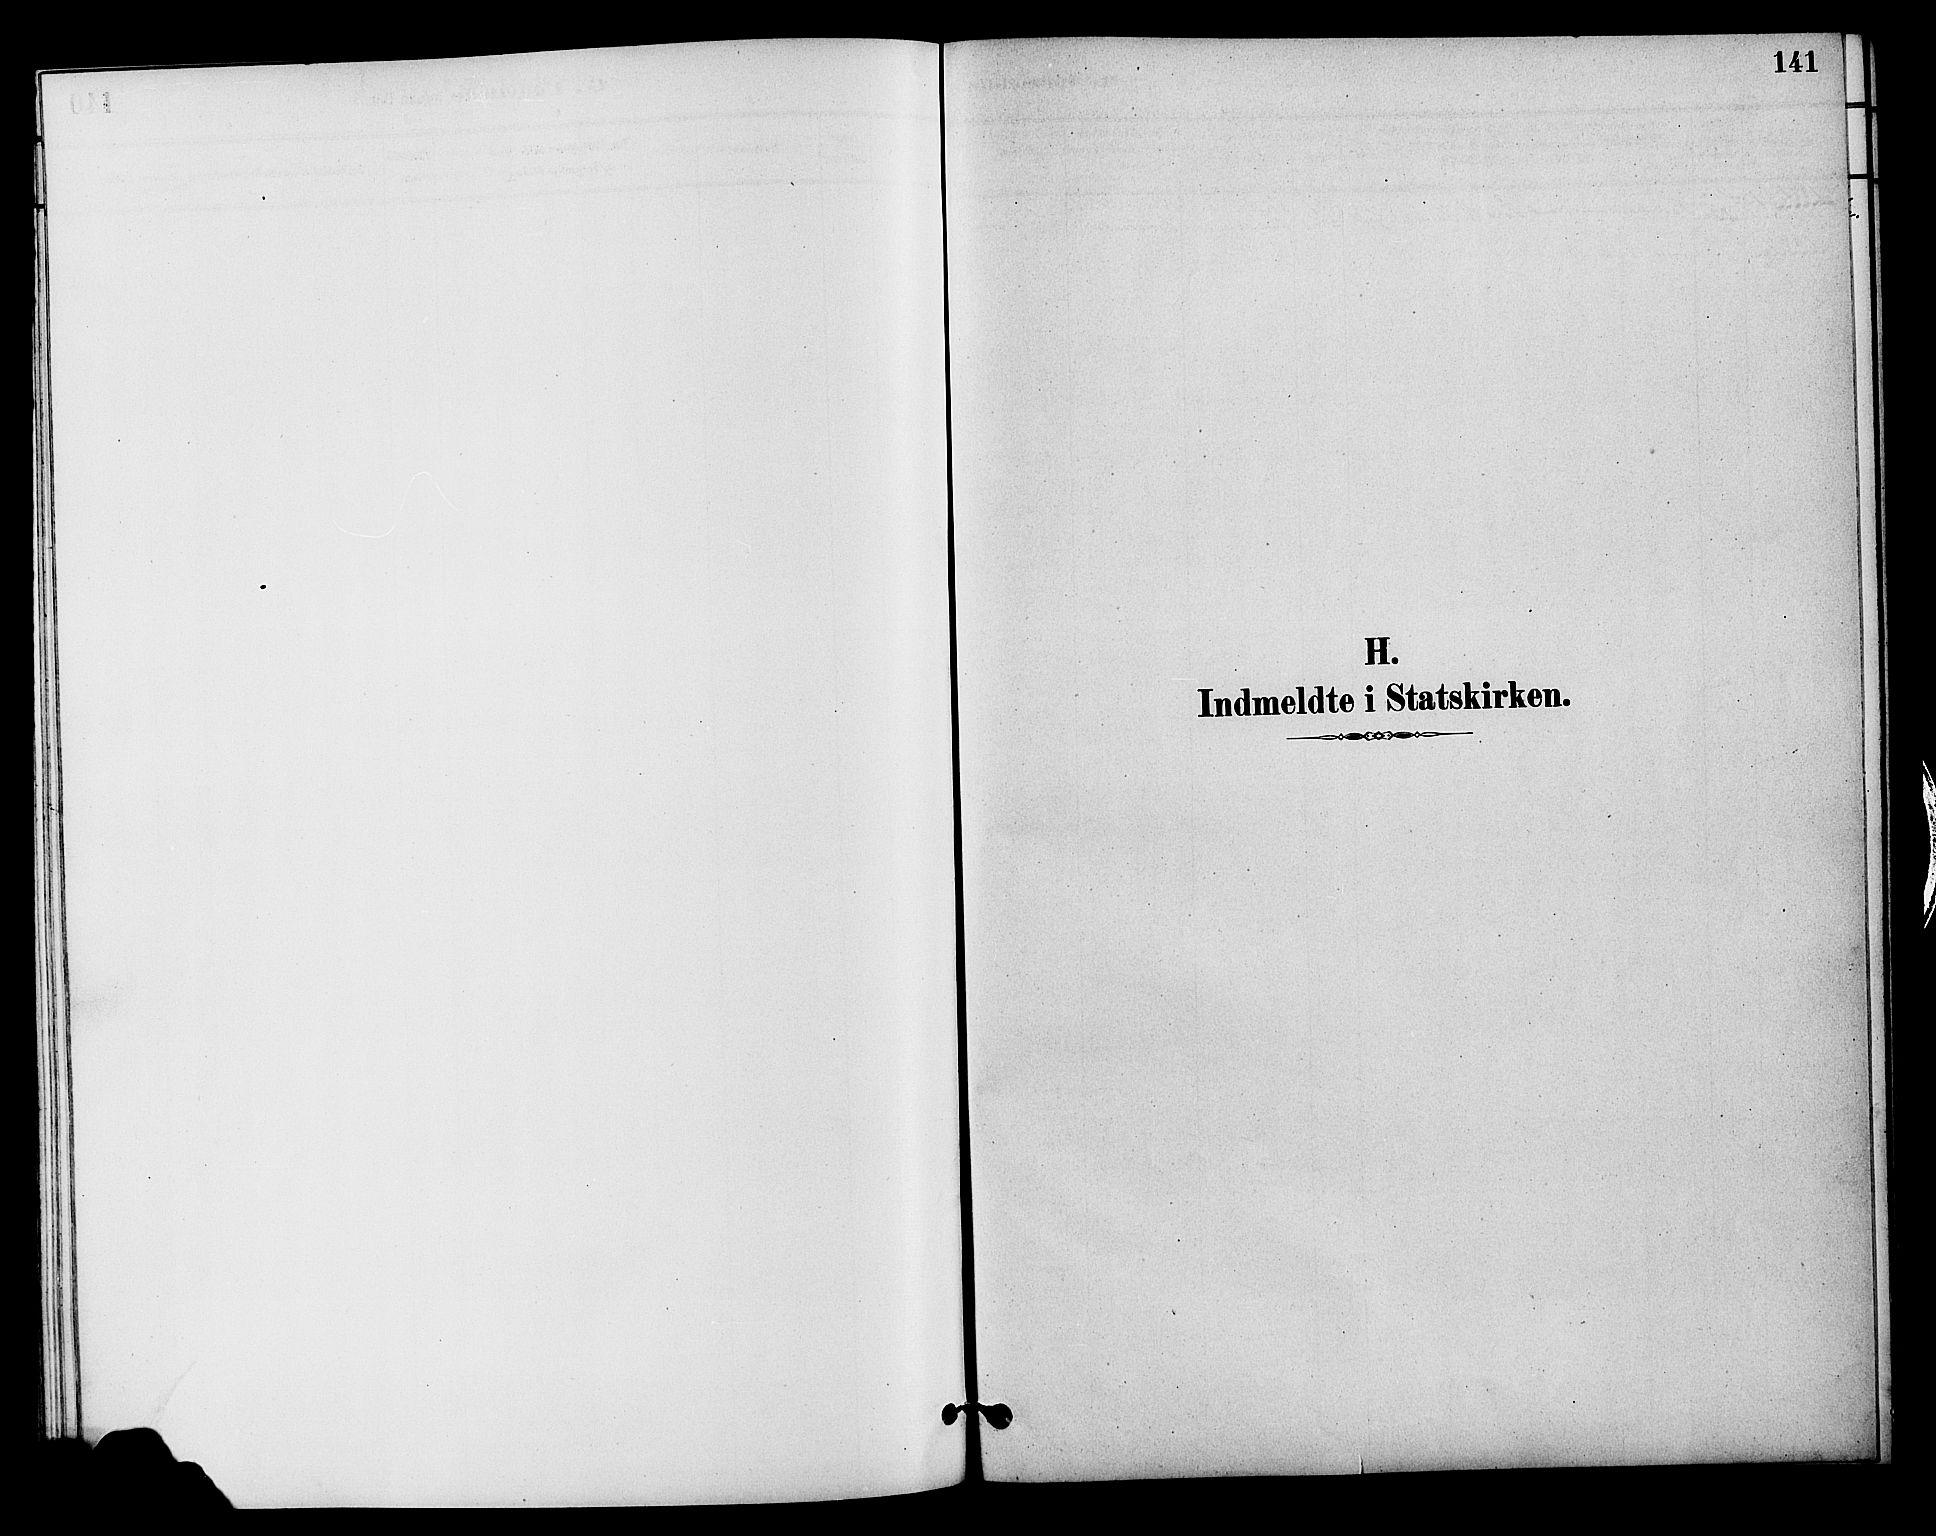 SAH, Vestre Slidre prestekontor, Klokkerbok nr. 4, 1881-1912, s. 141